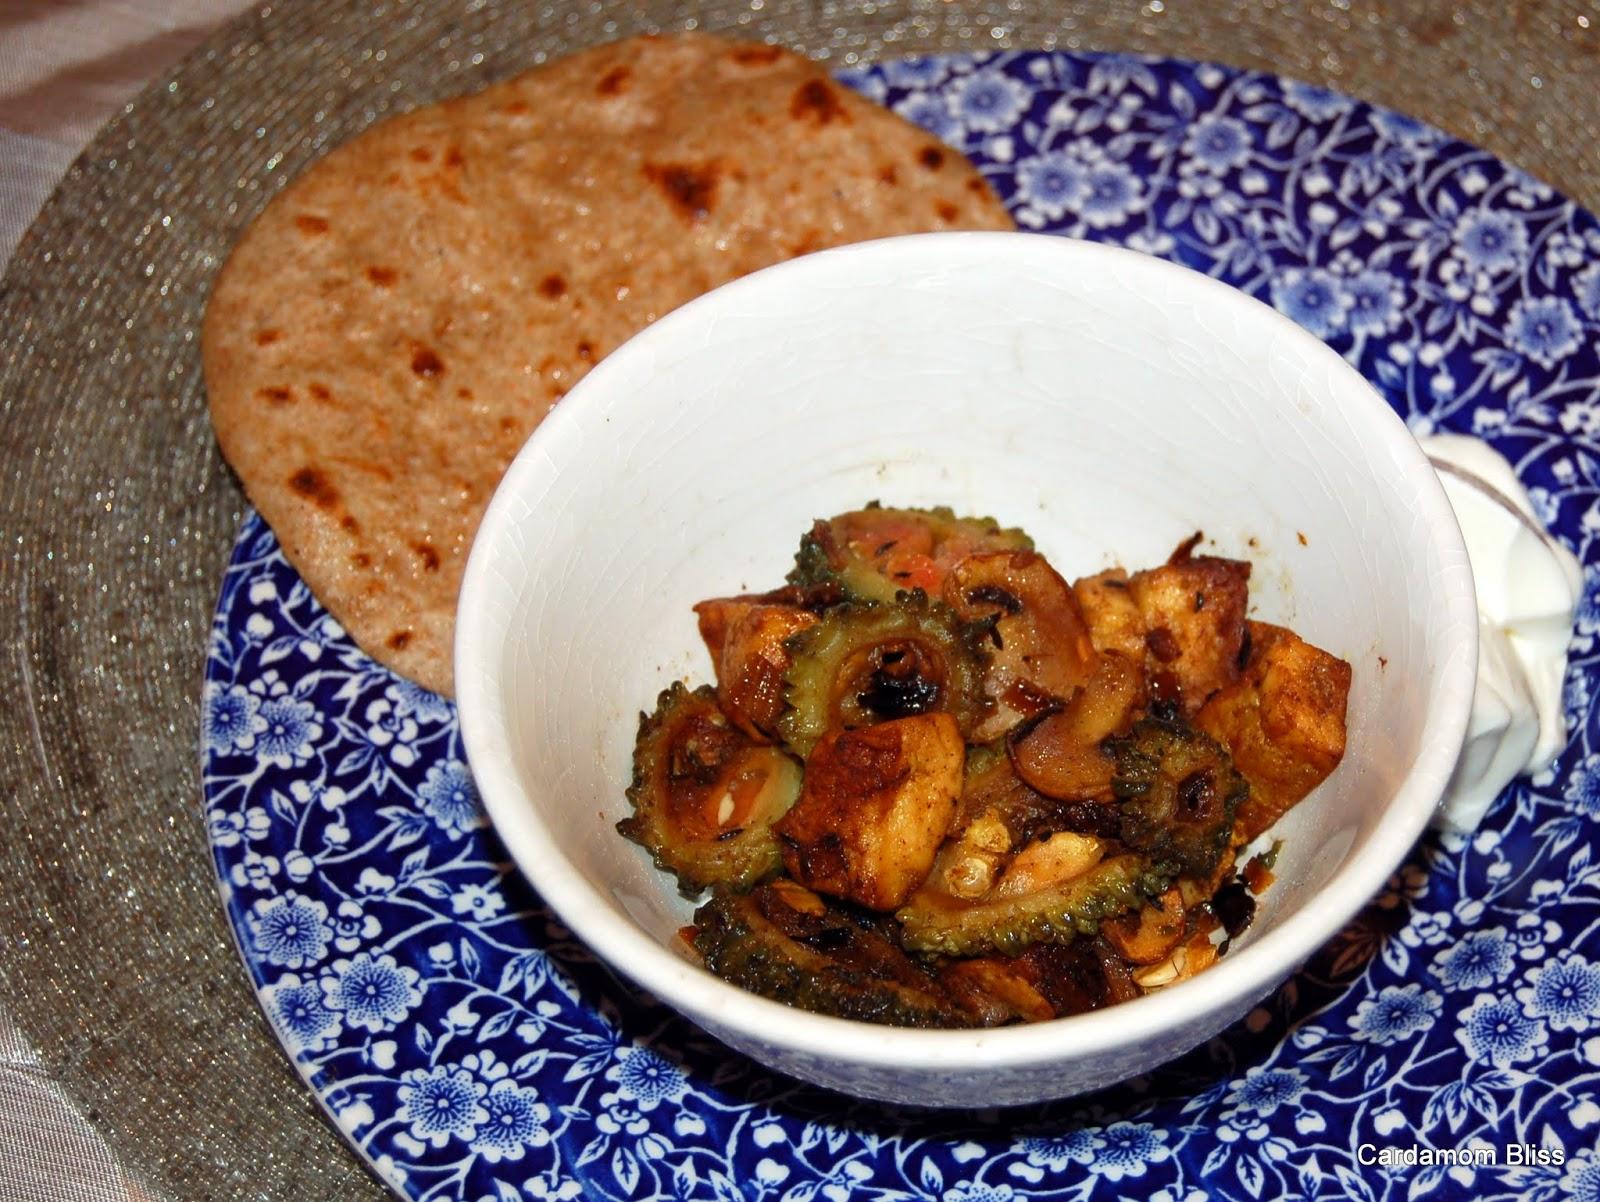 Kerela, mushroom and paneer masala